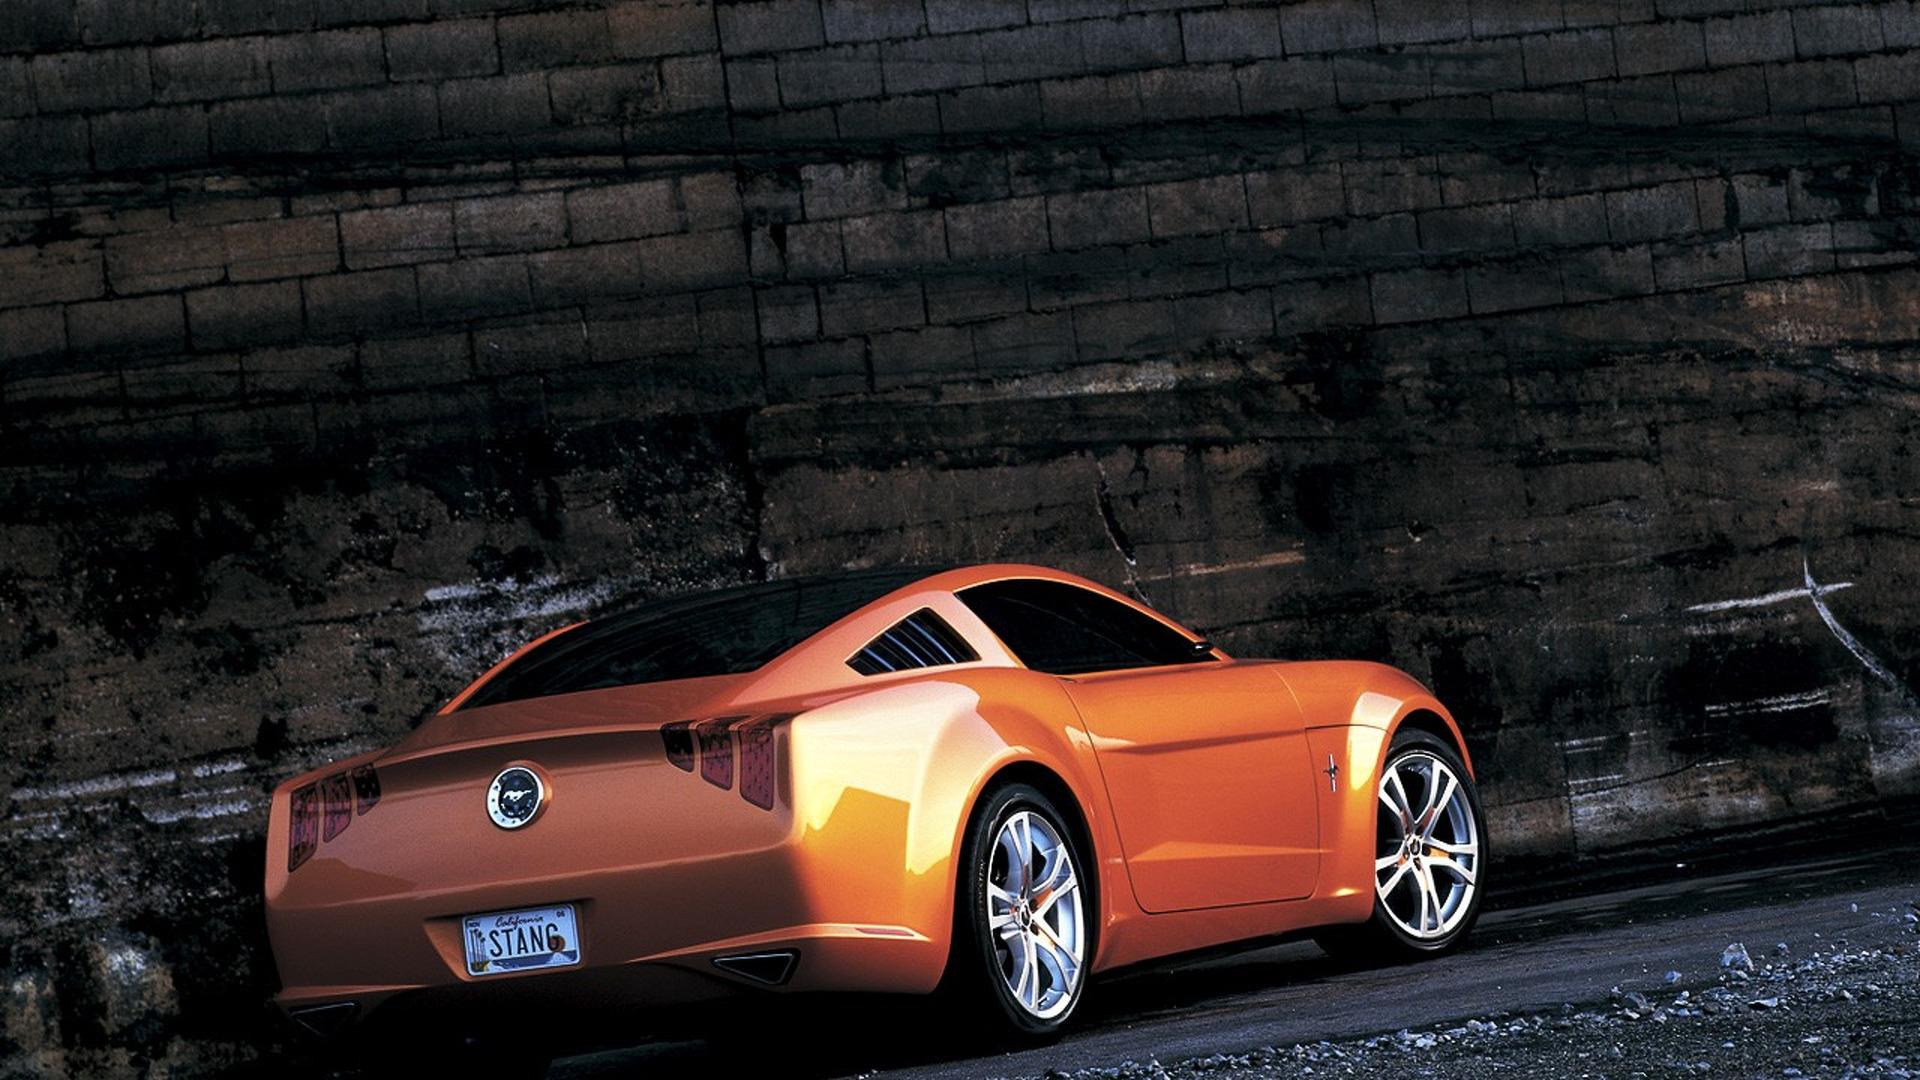 2006-ford-mustang-giugiaro-concept (22)